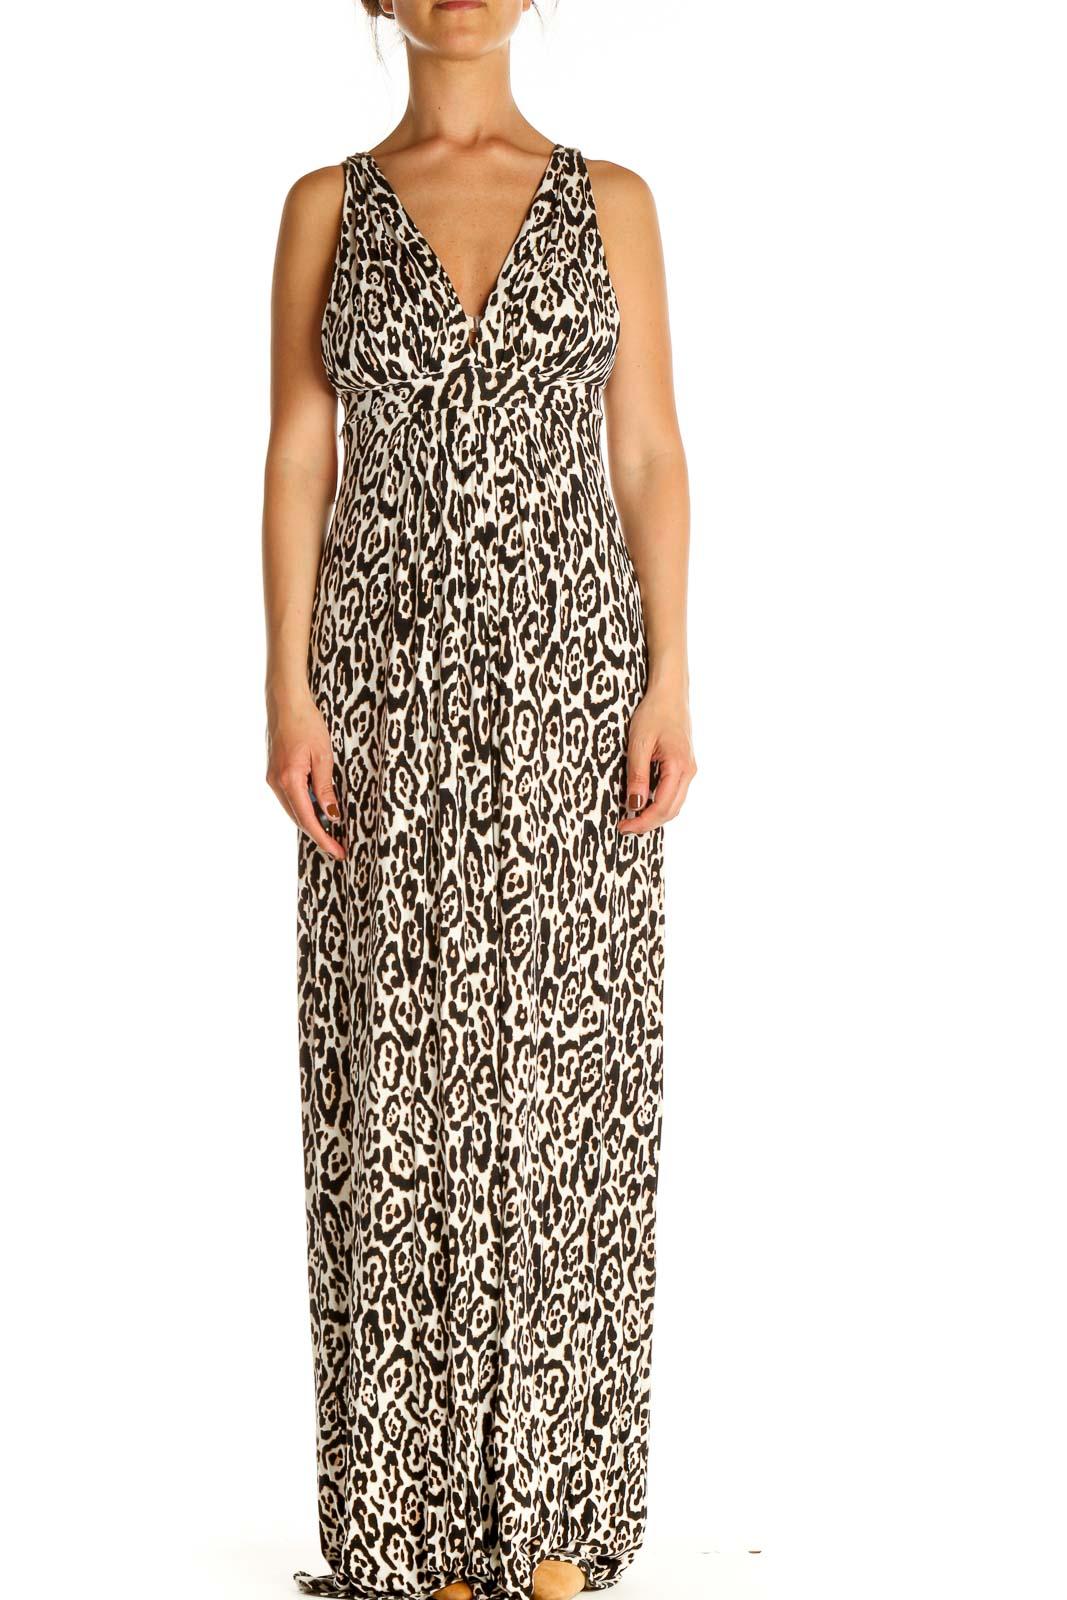 Beige Animal Print Column Dress Front